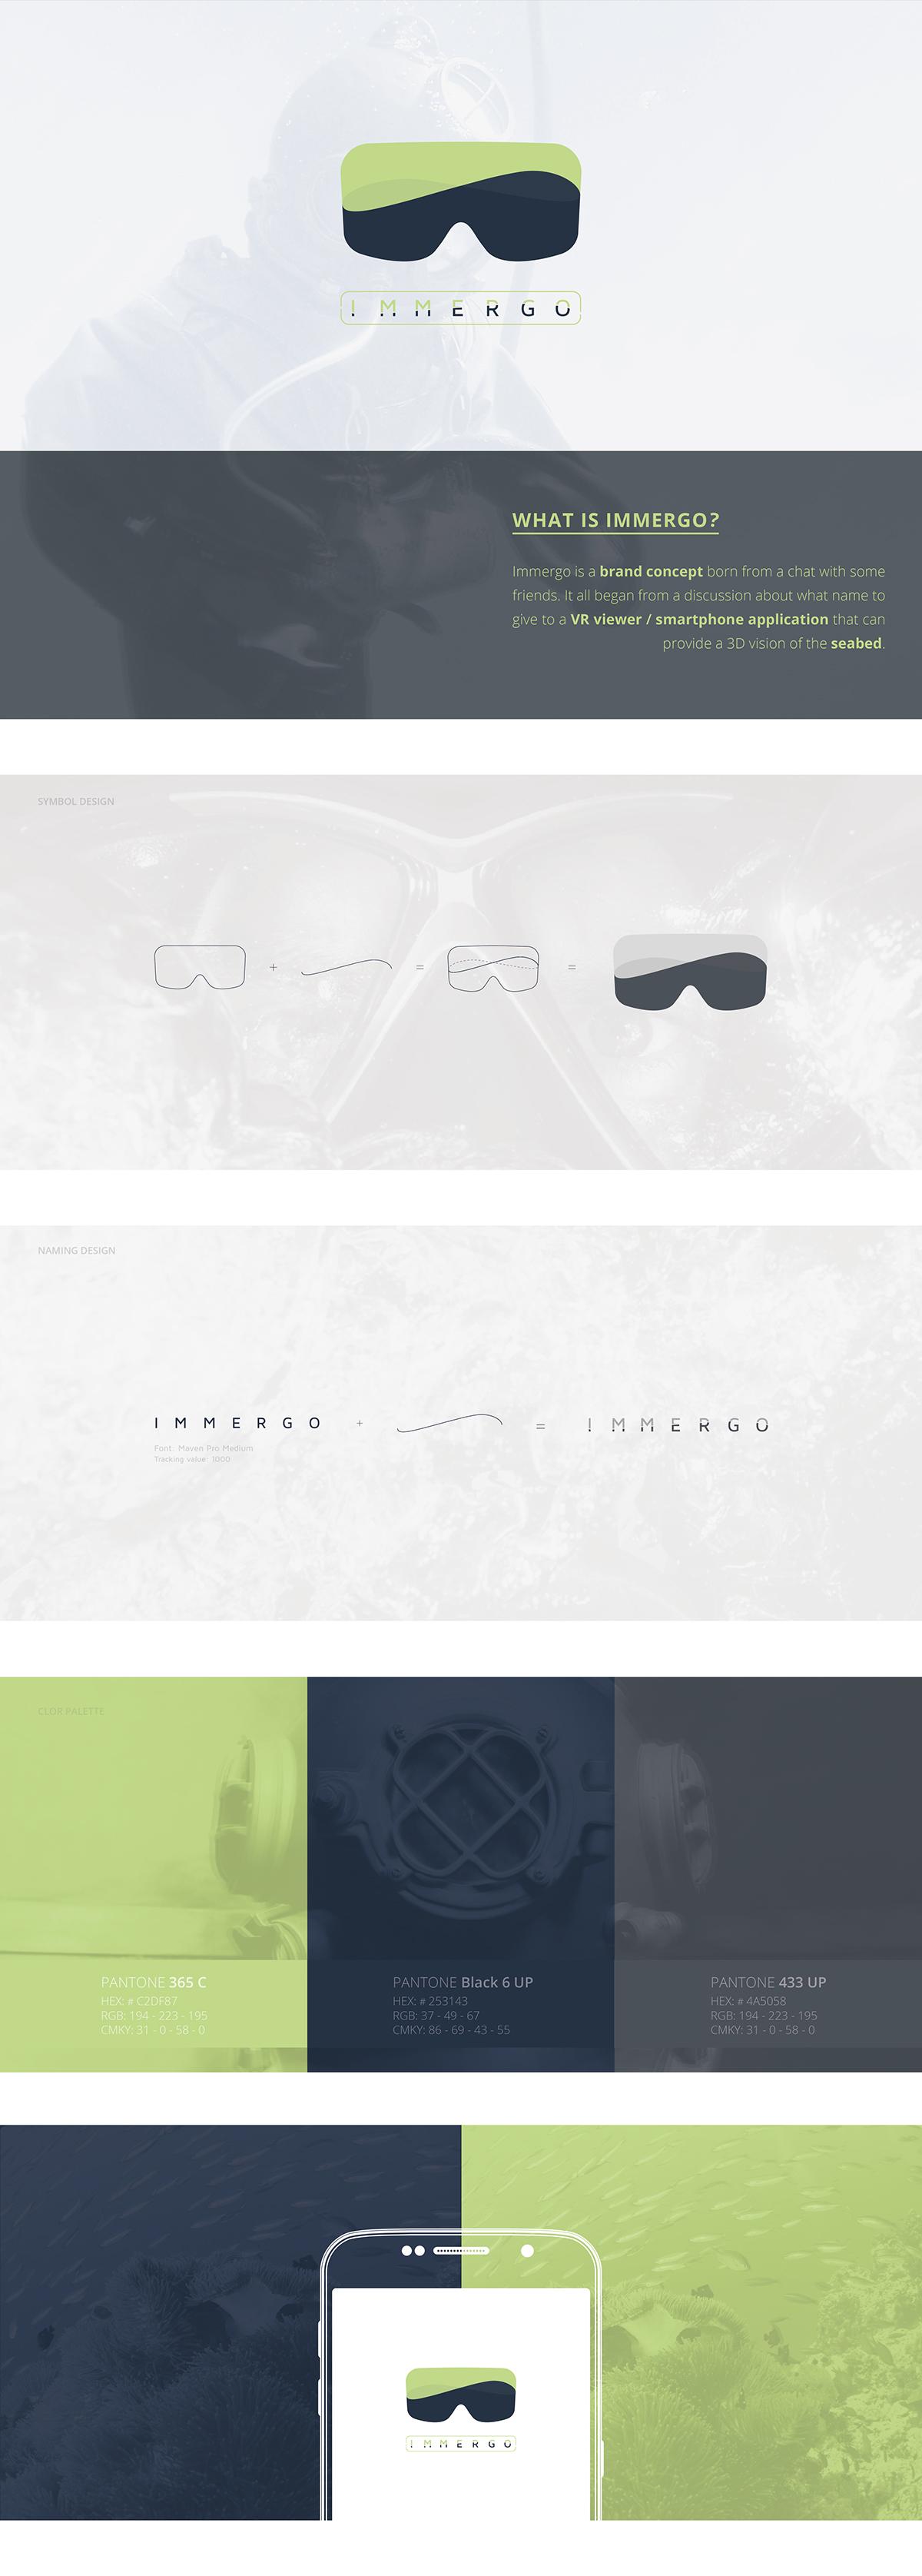 brand logo vr mask underwater 3D cardboard app application seabed